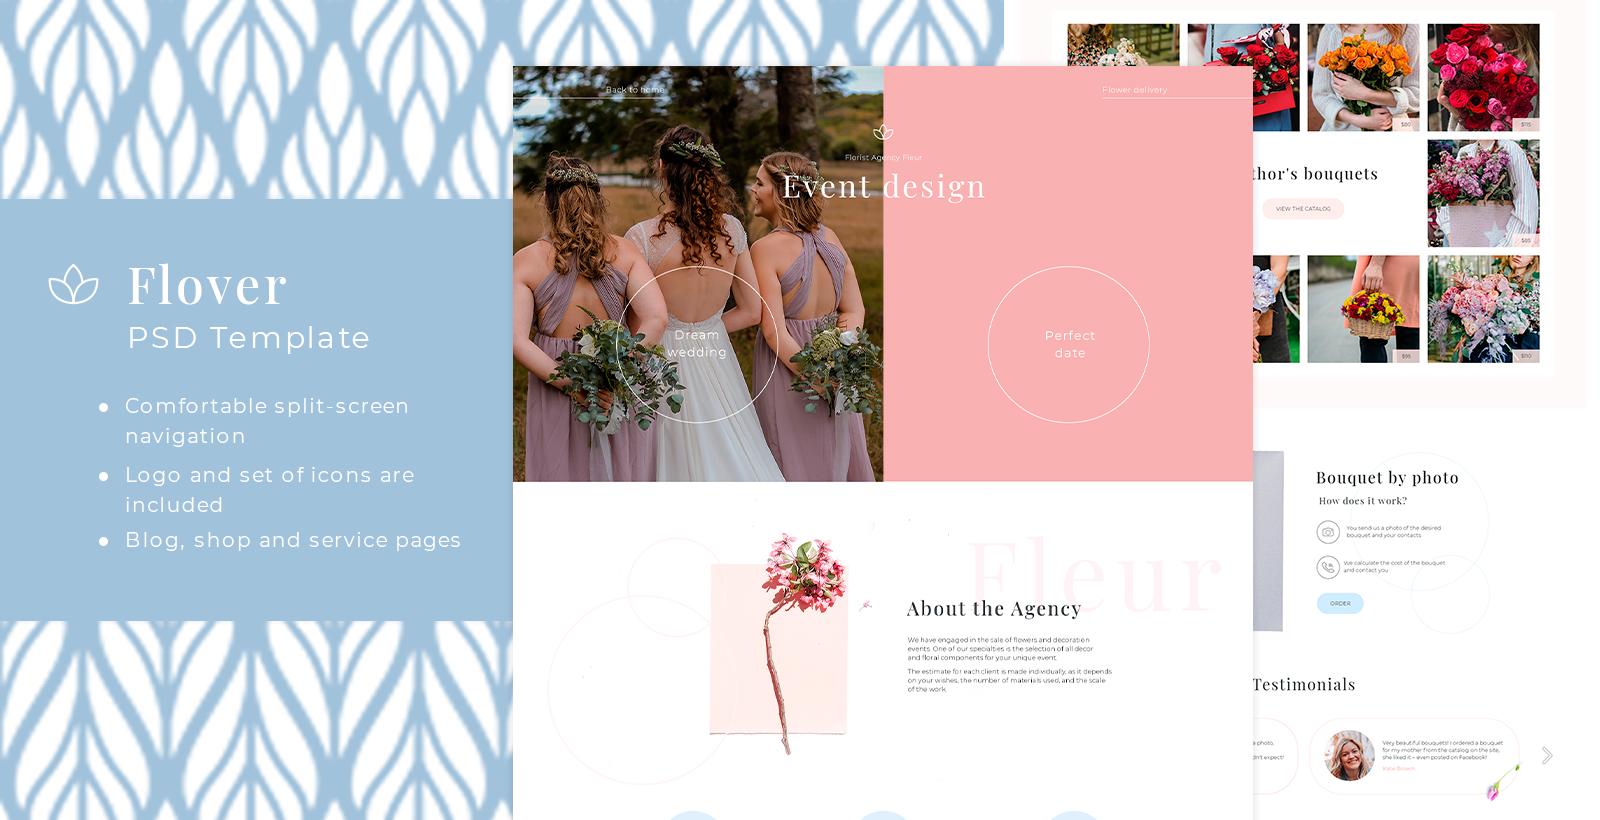 Szablon PSD Flover - Flower Shop and Event Design PSD #101763